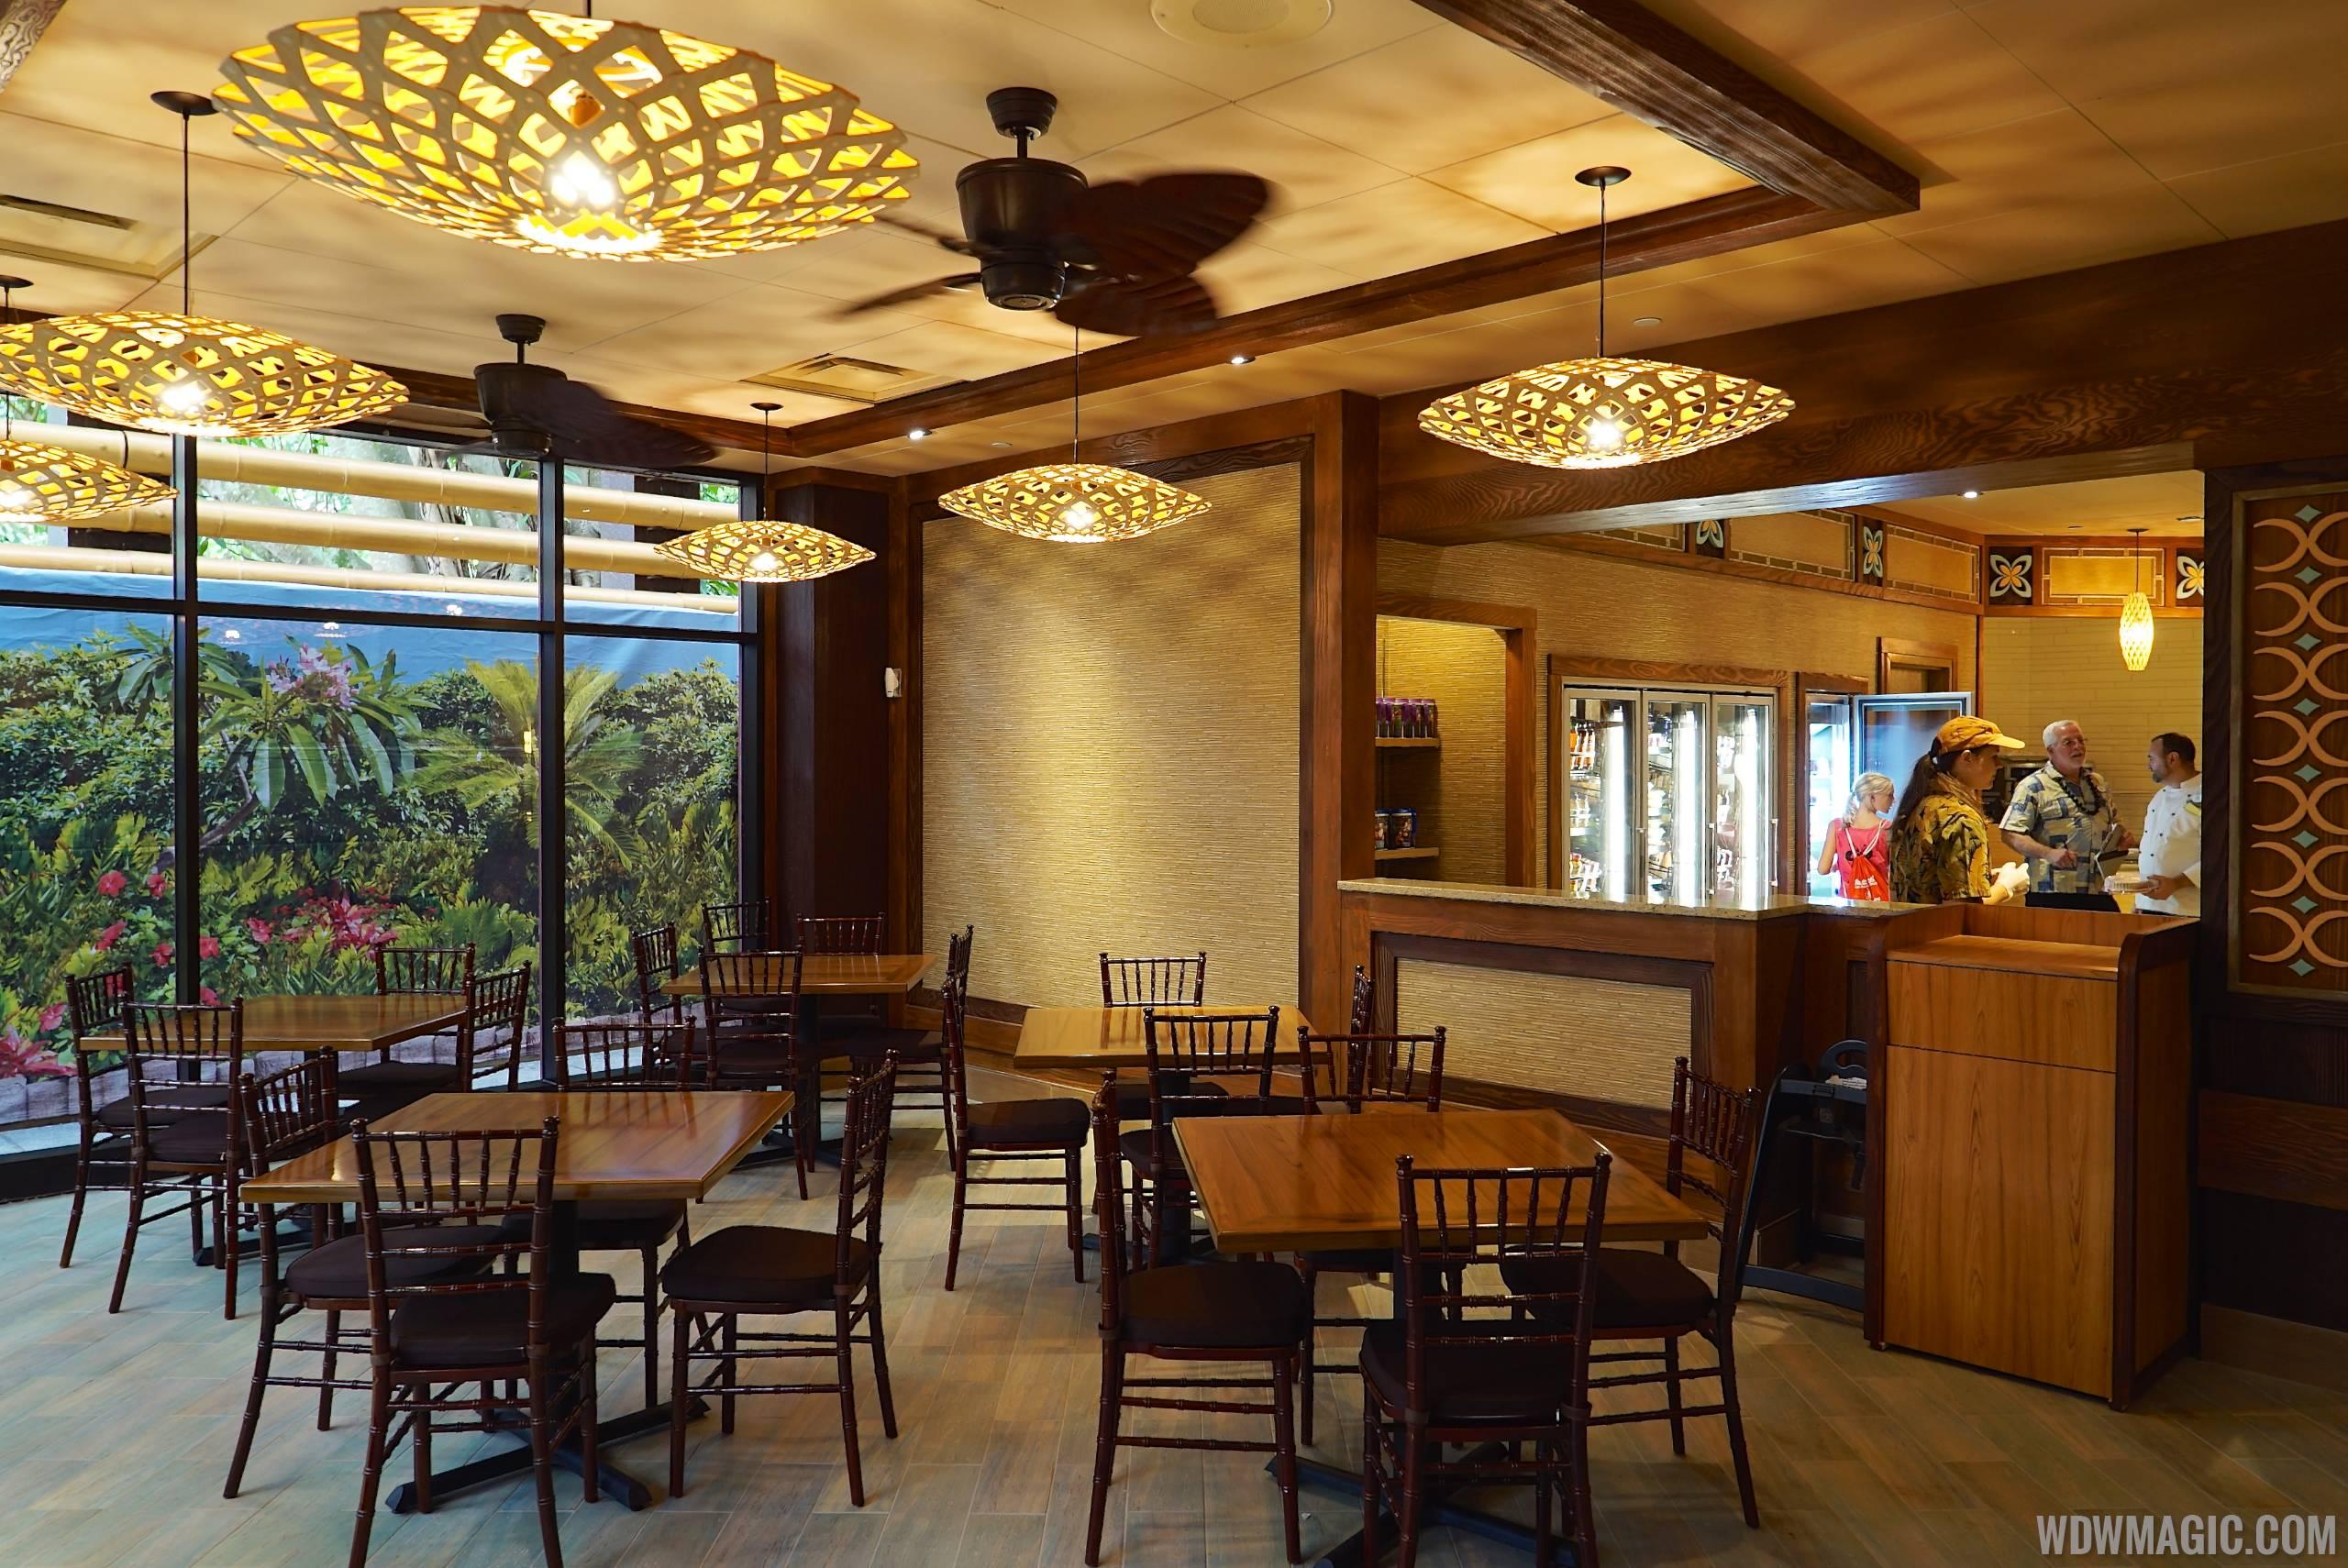 New Captain Cook's at Disney's Polynesian Village Resort